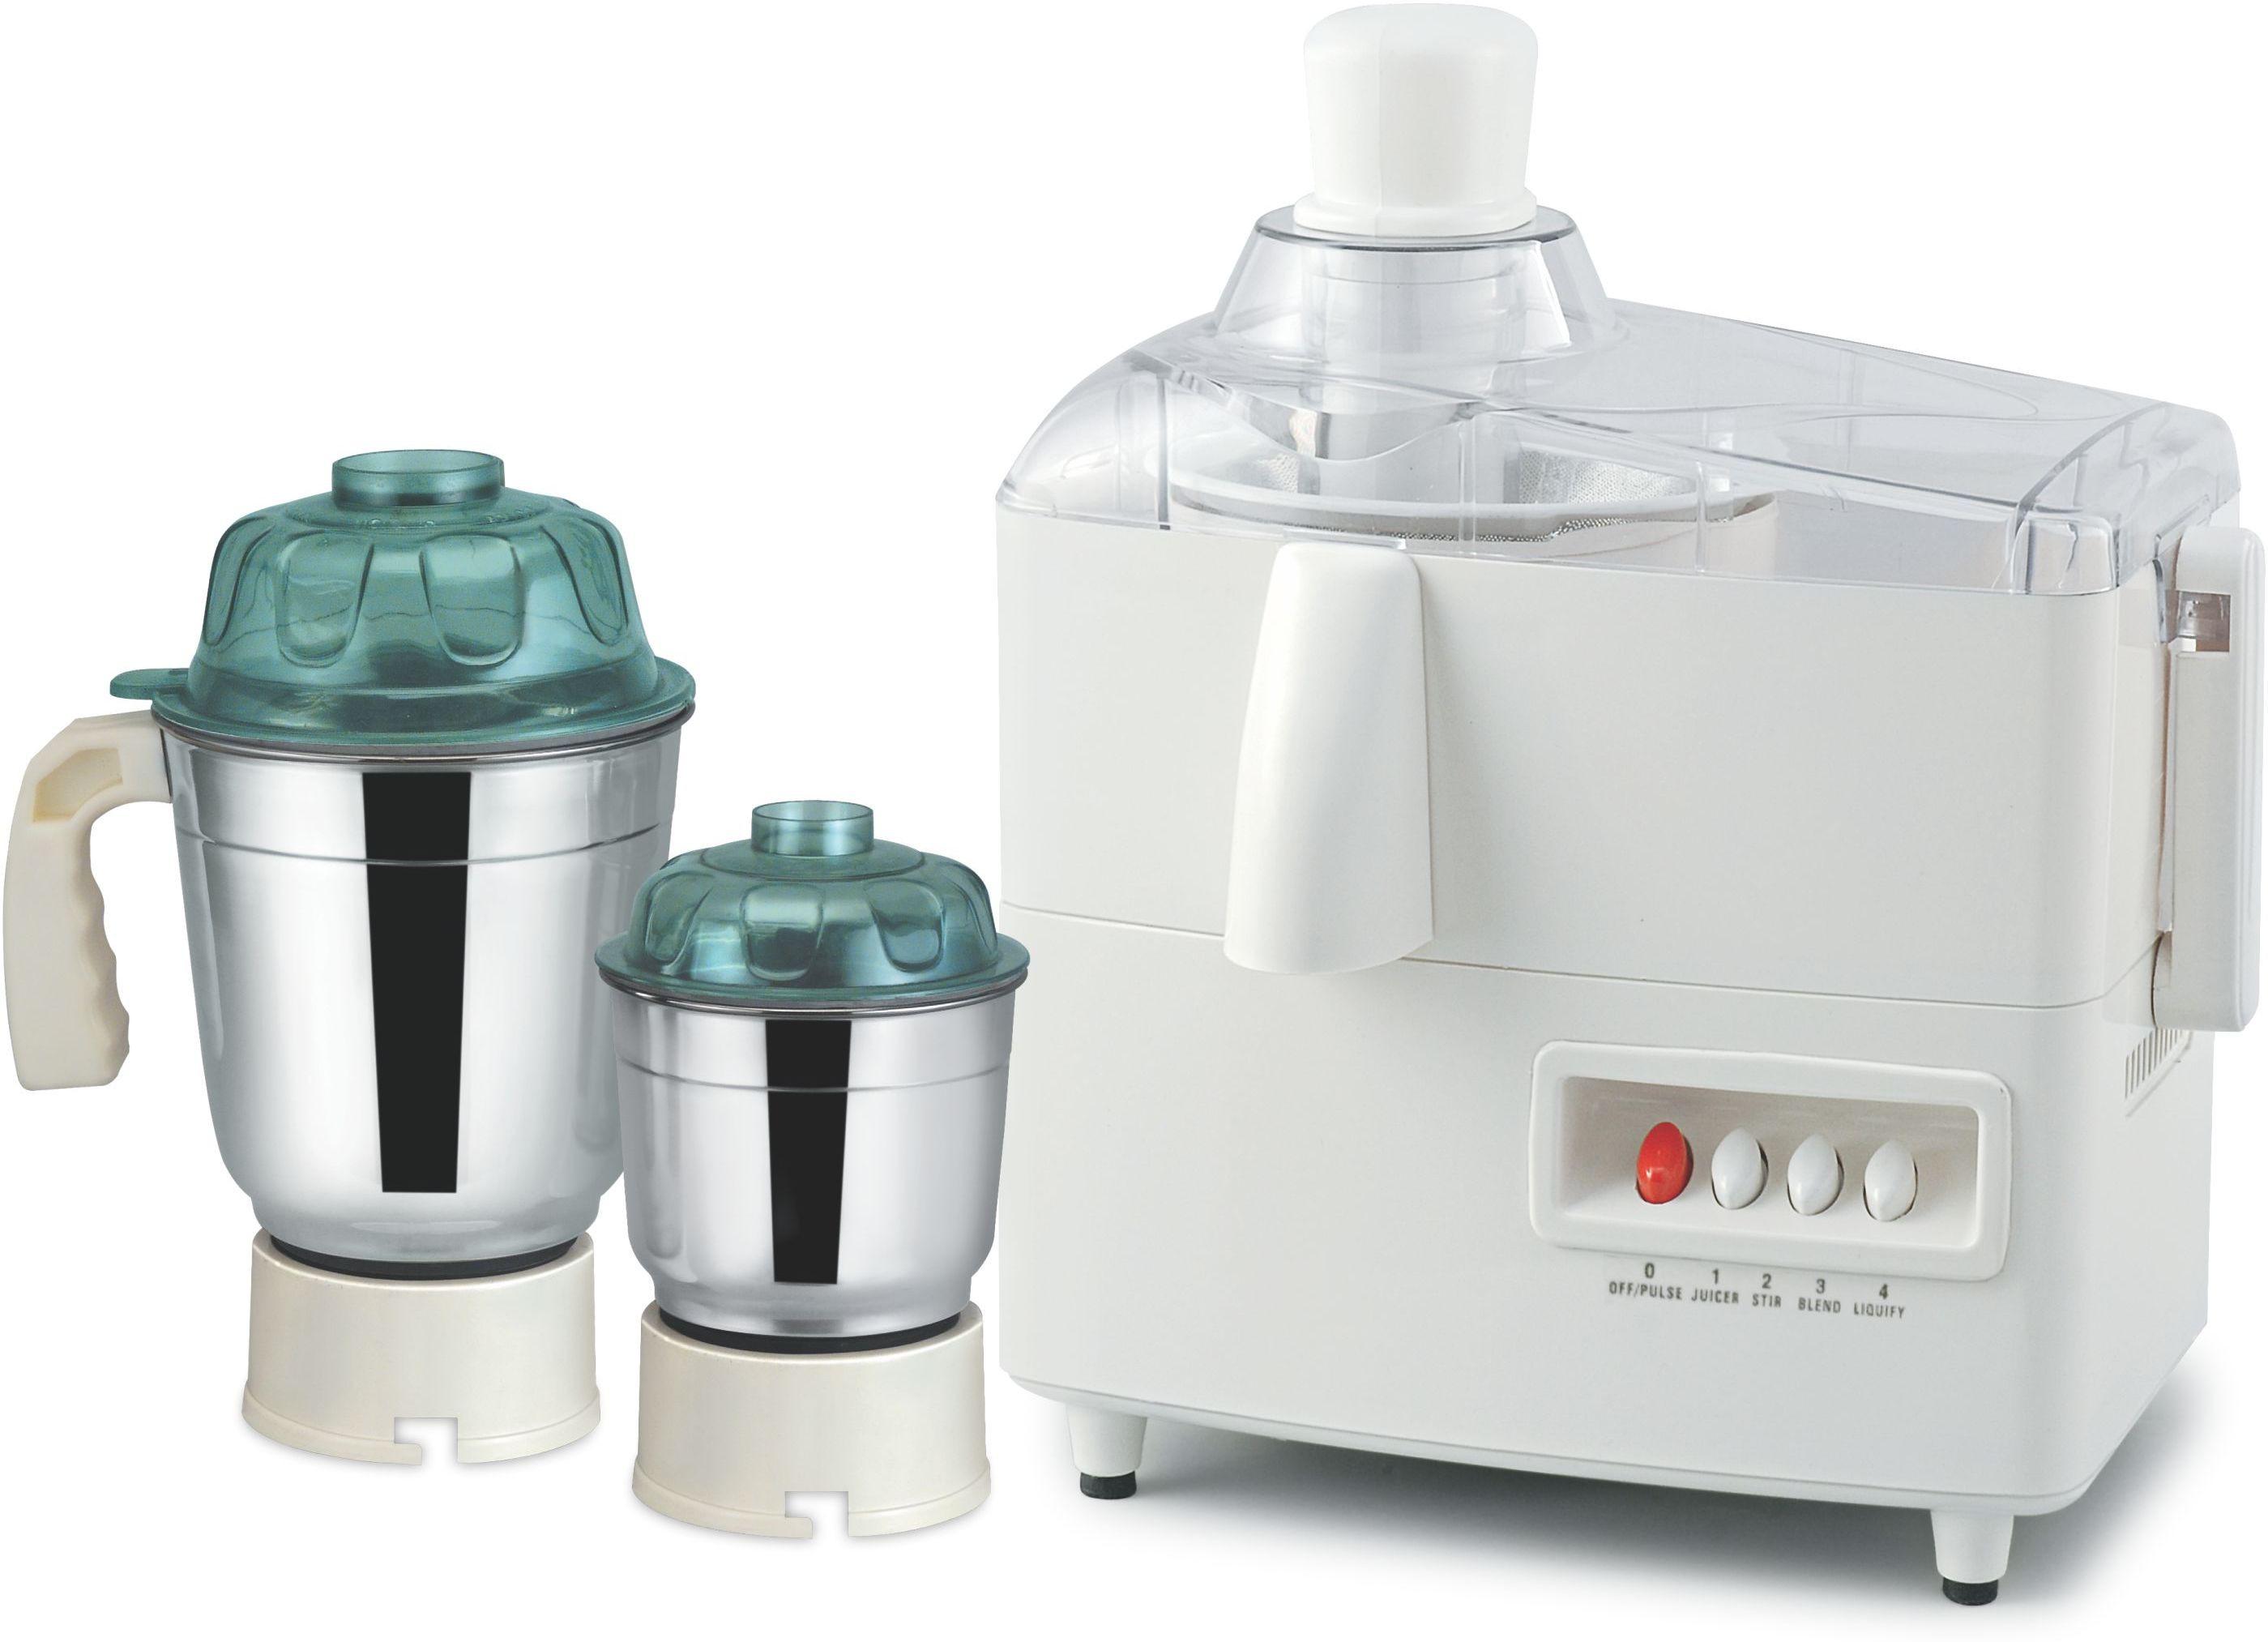 Sunny MARK01 500 W Juicer Mixer Grinder(White, 2 Jars)